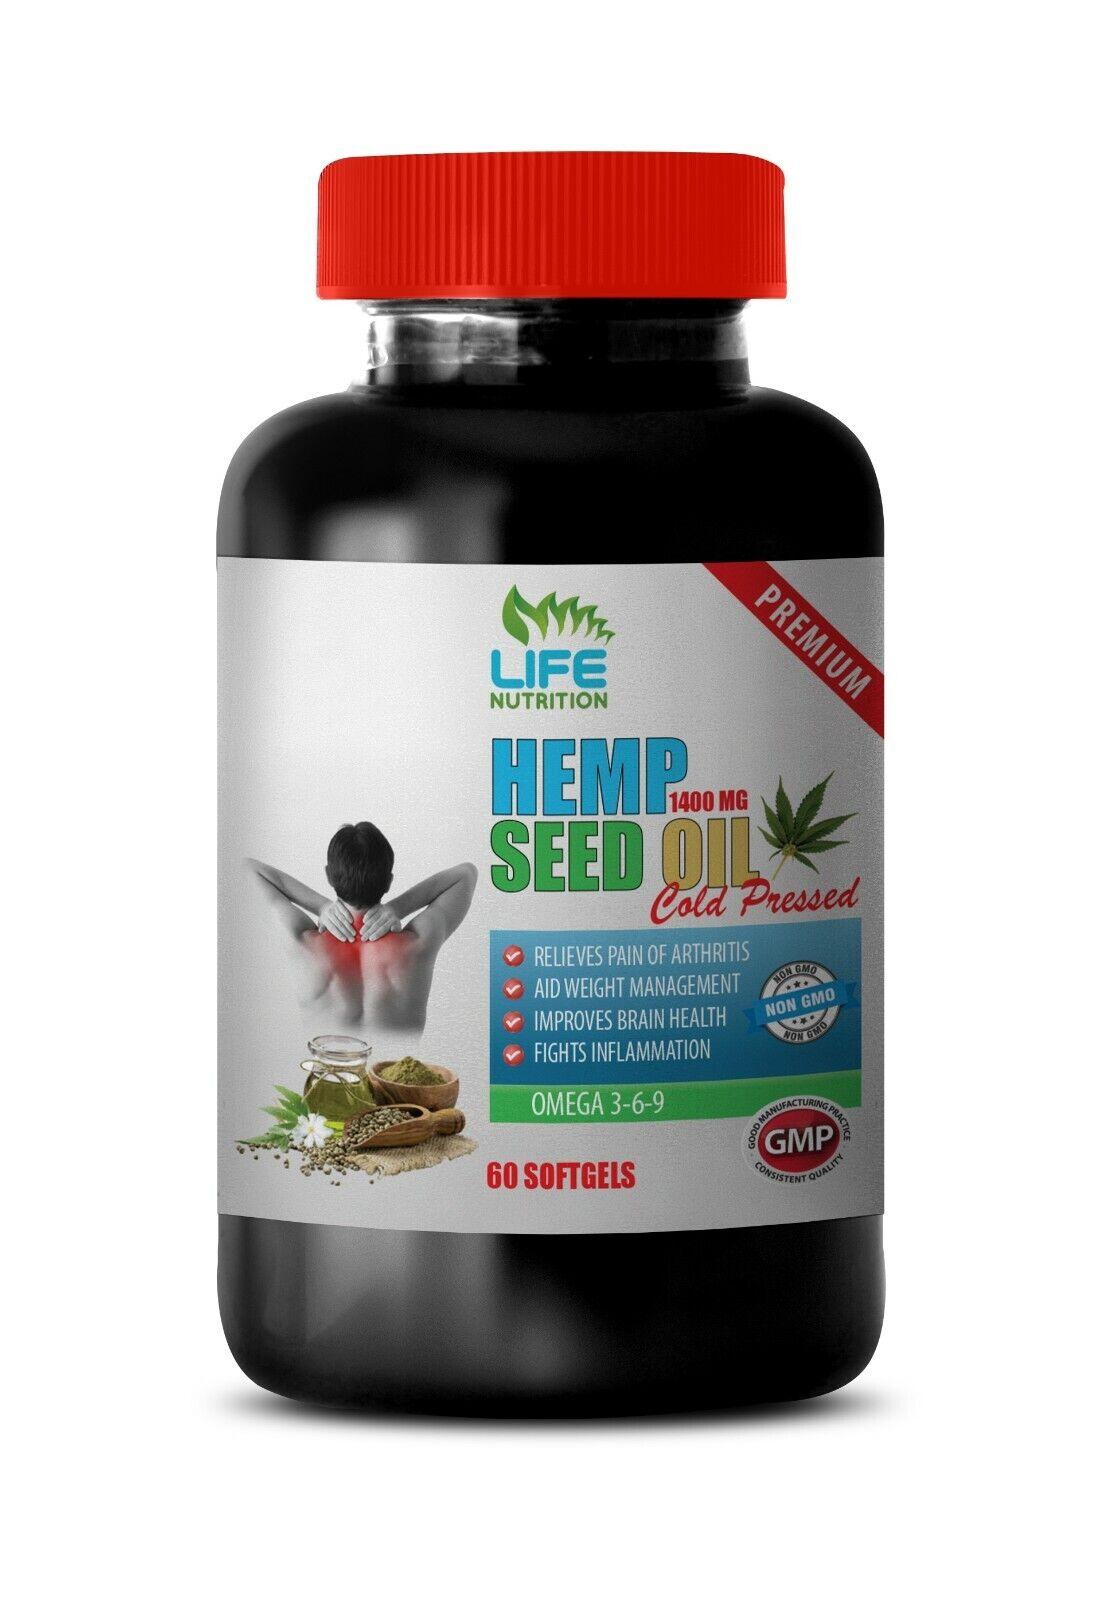 essential fatty acid, ORGANIC HEMP SEED OIL 1400mg, linoleic acid omega 6 1B 8